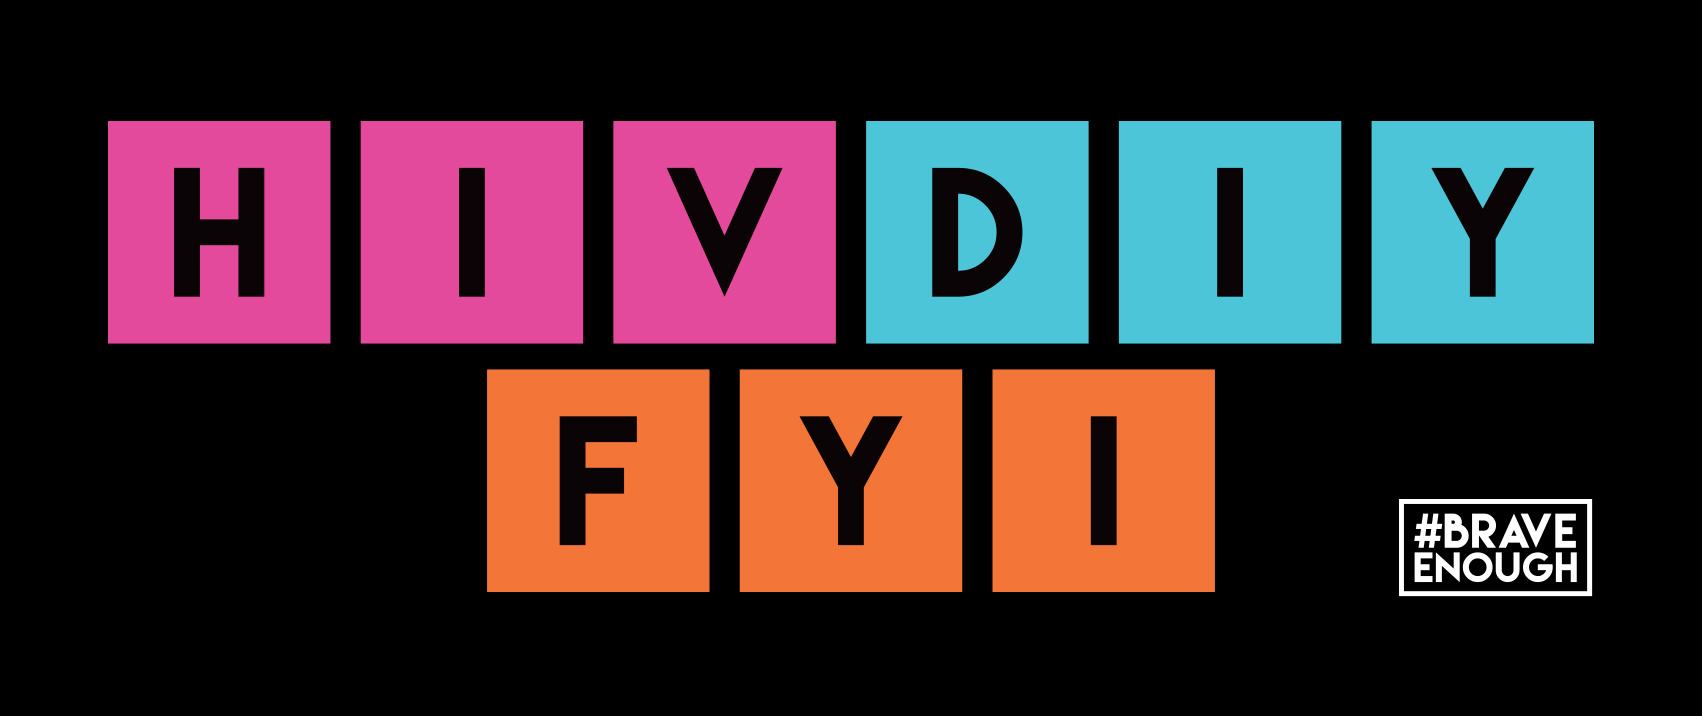 HIV DIY FYI – Self Testing